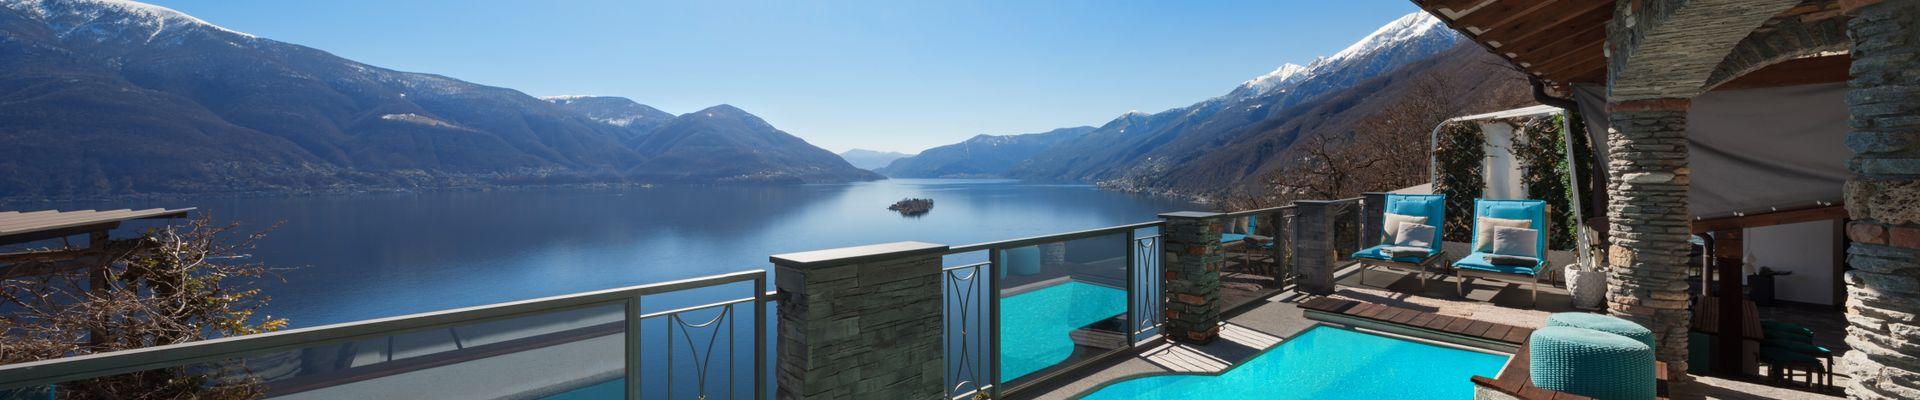 Wellnesshotels in Tirol